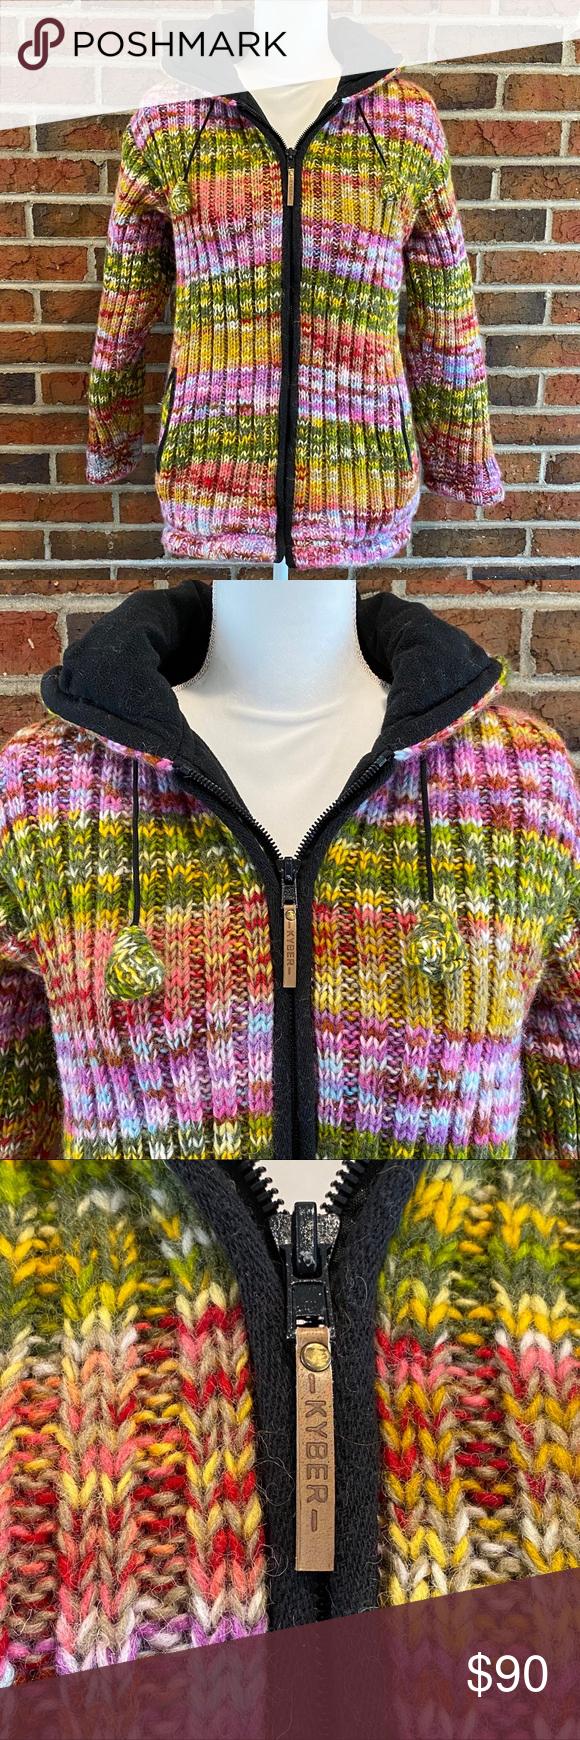 Kyber Outerwear Wool Fleece Lined Jacket Size L Line Jackets Outerwear Clothes Design [ 1740 x 580 Pixel ]